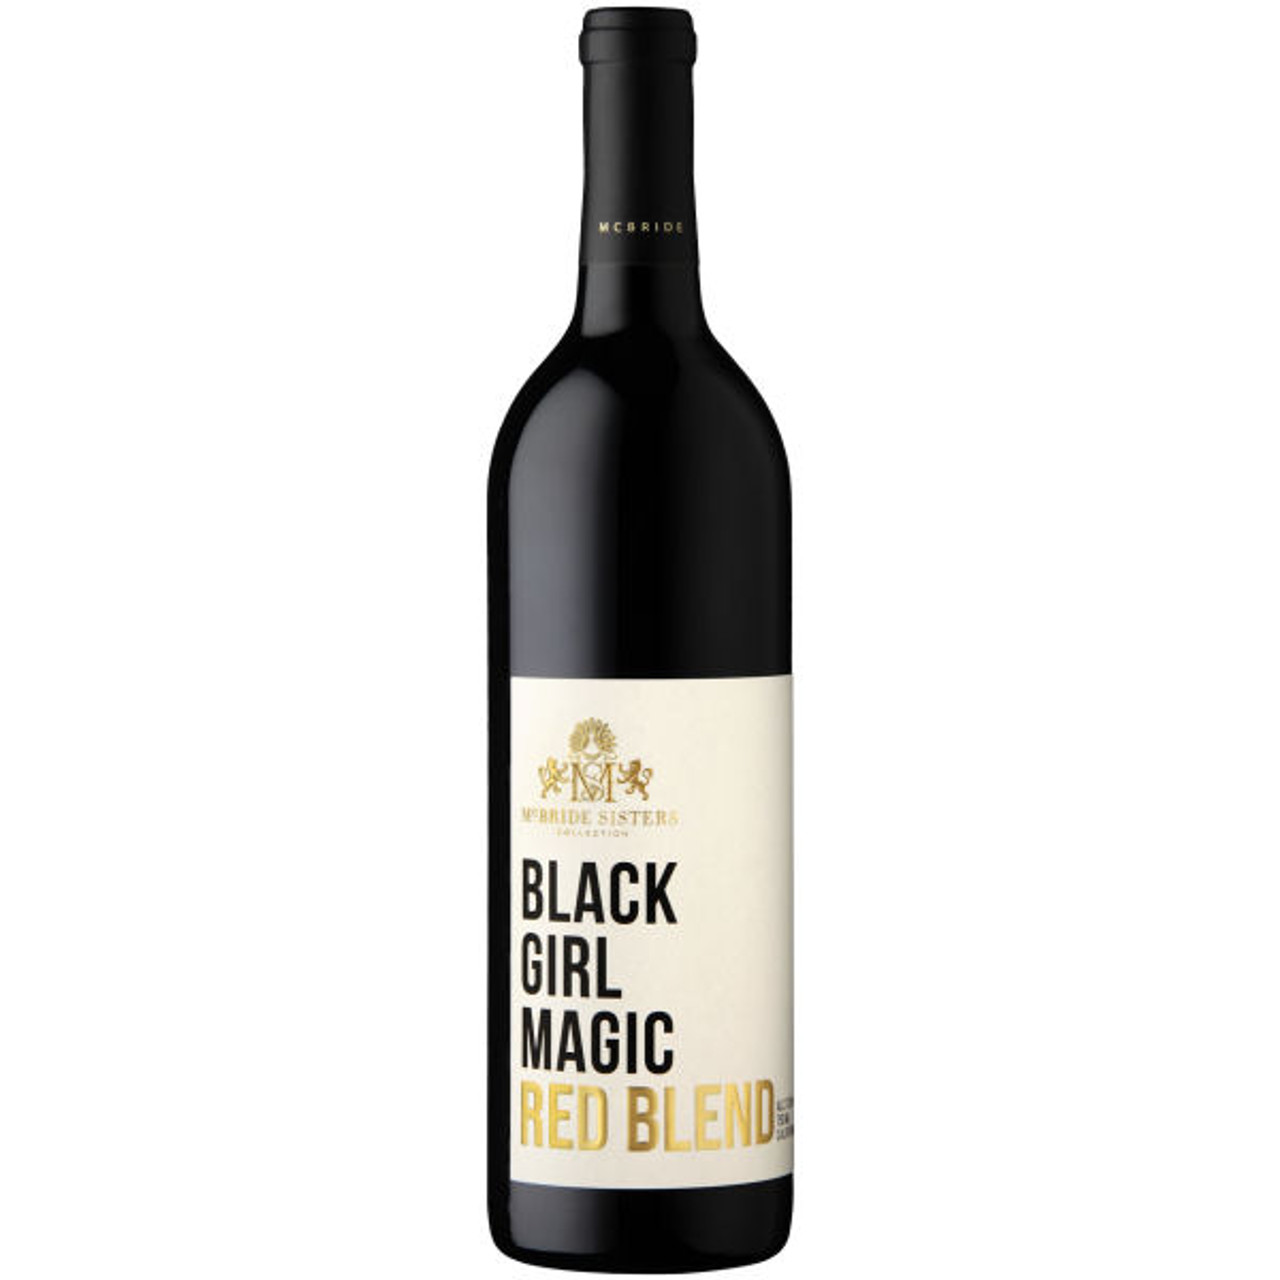 McBride Sister Black Girl Magic California Red Blend